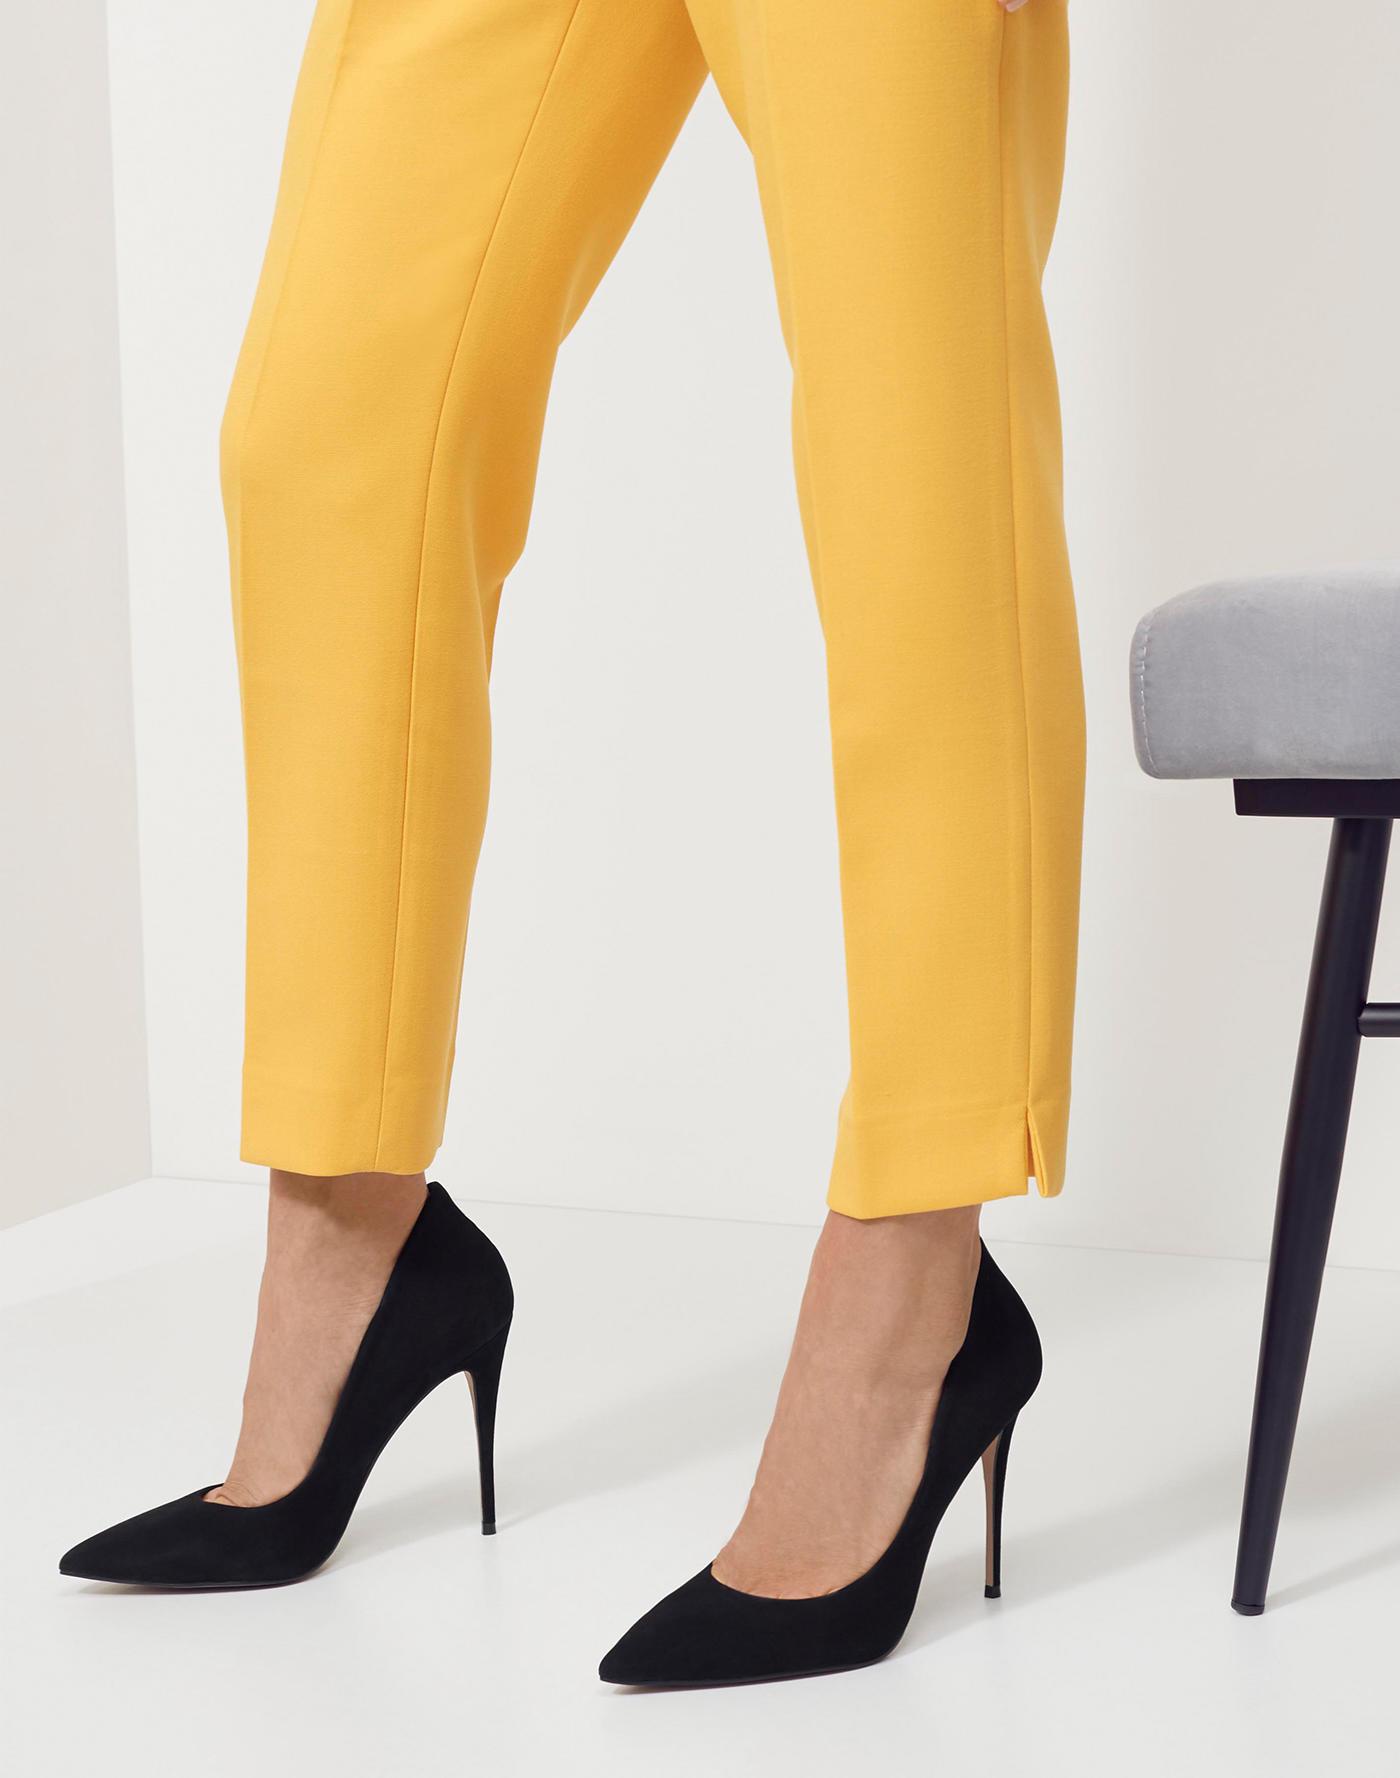 a598b20dfdc Heels